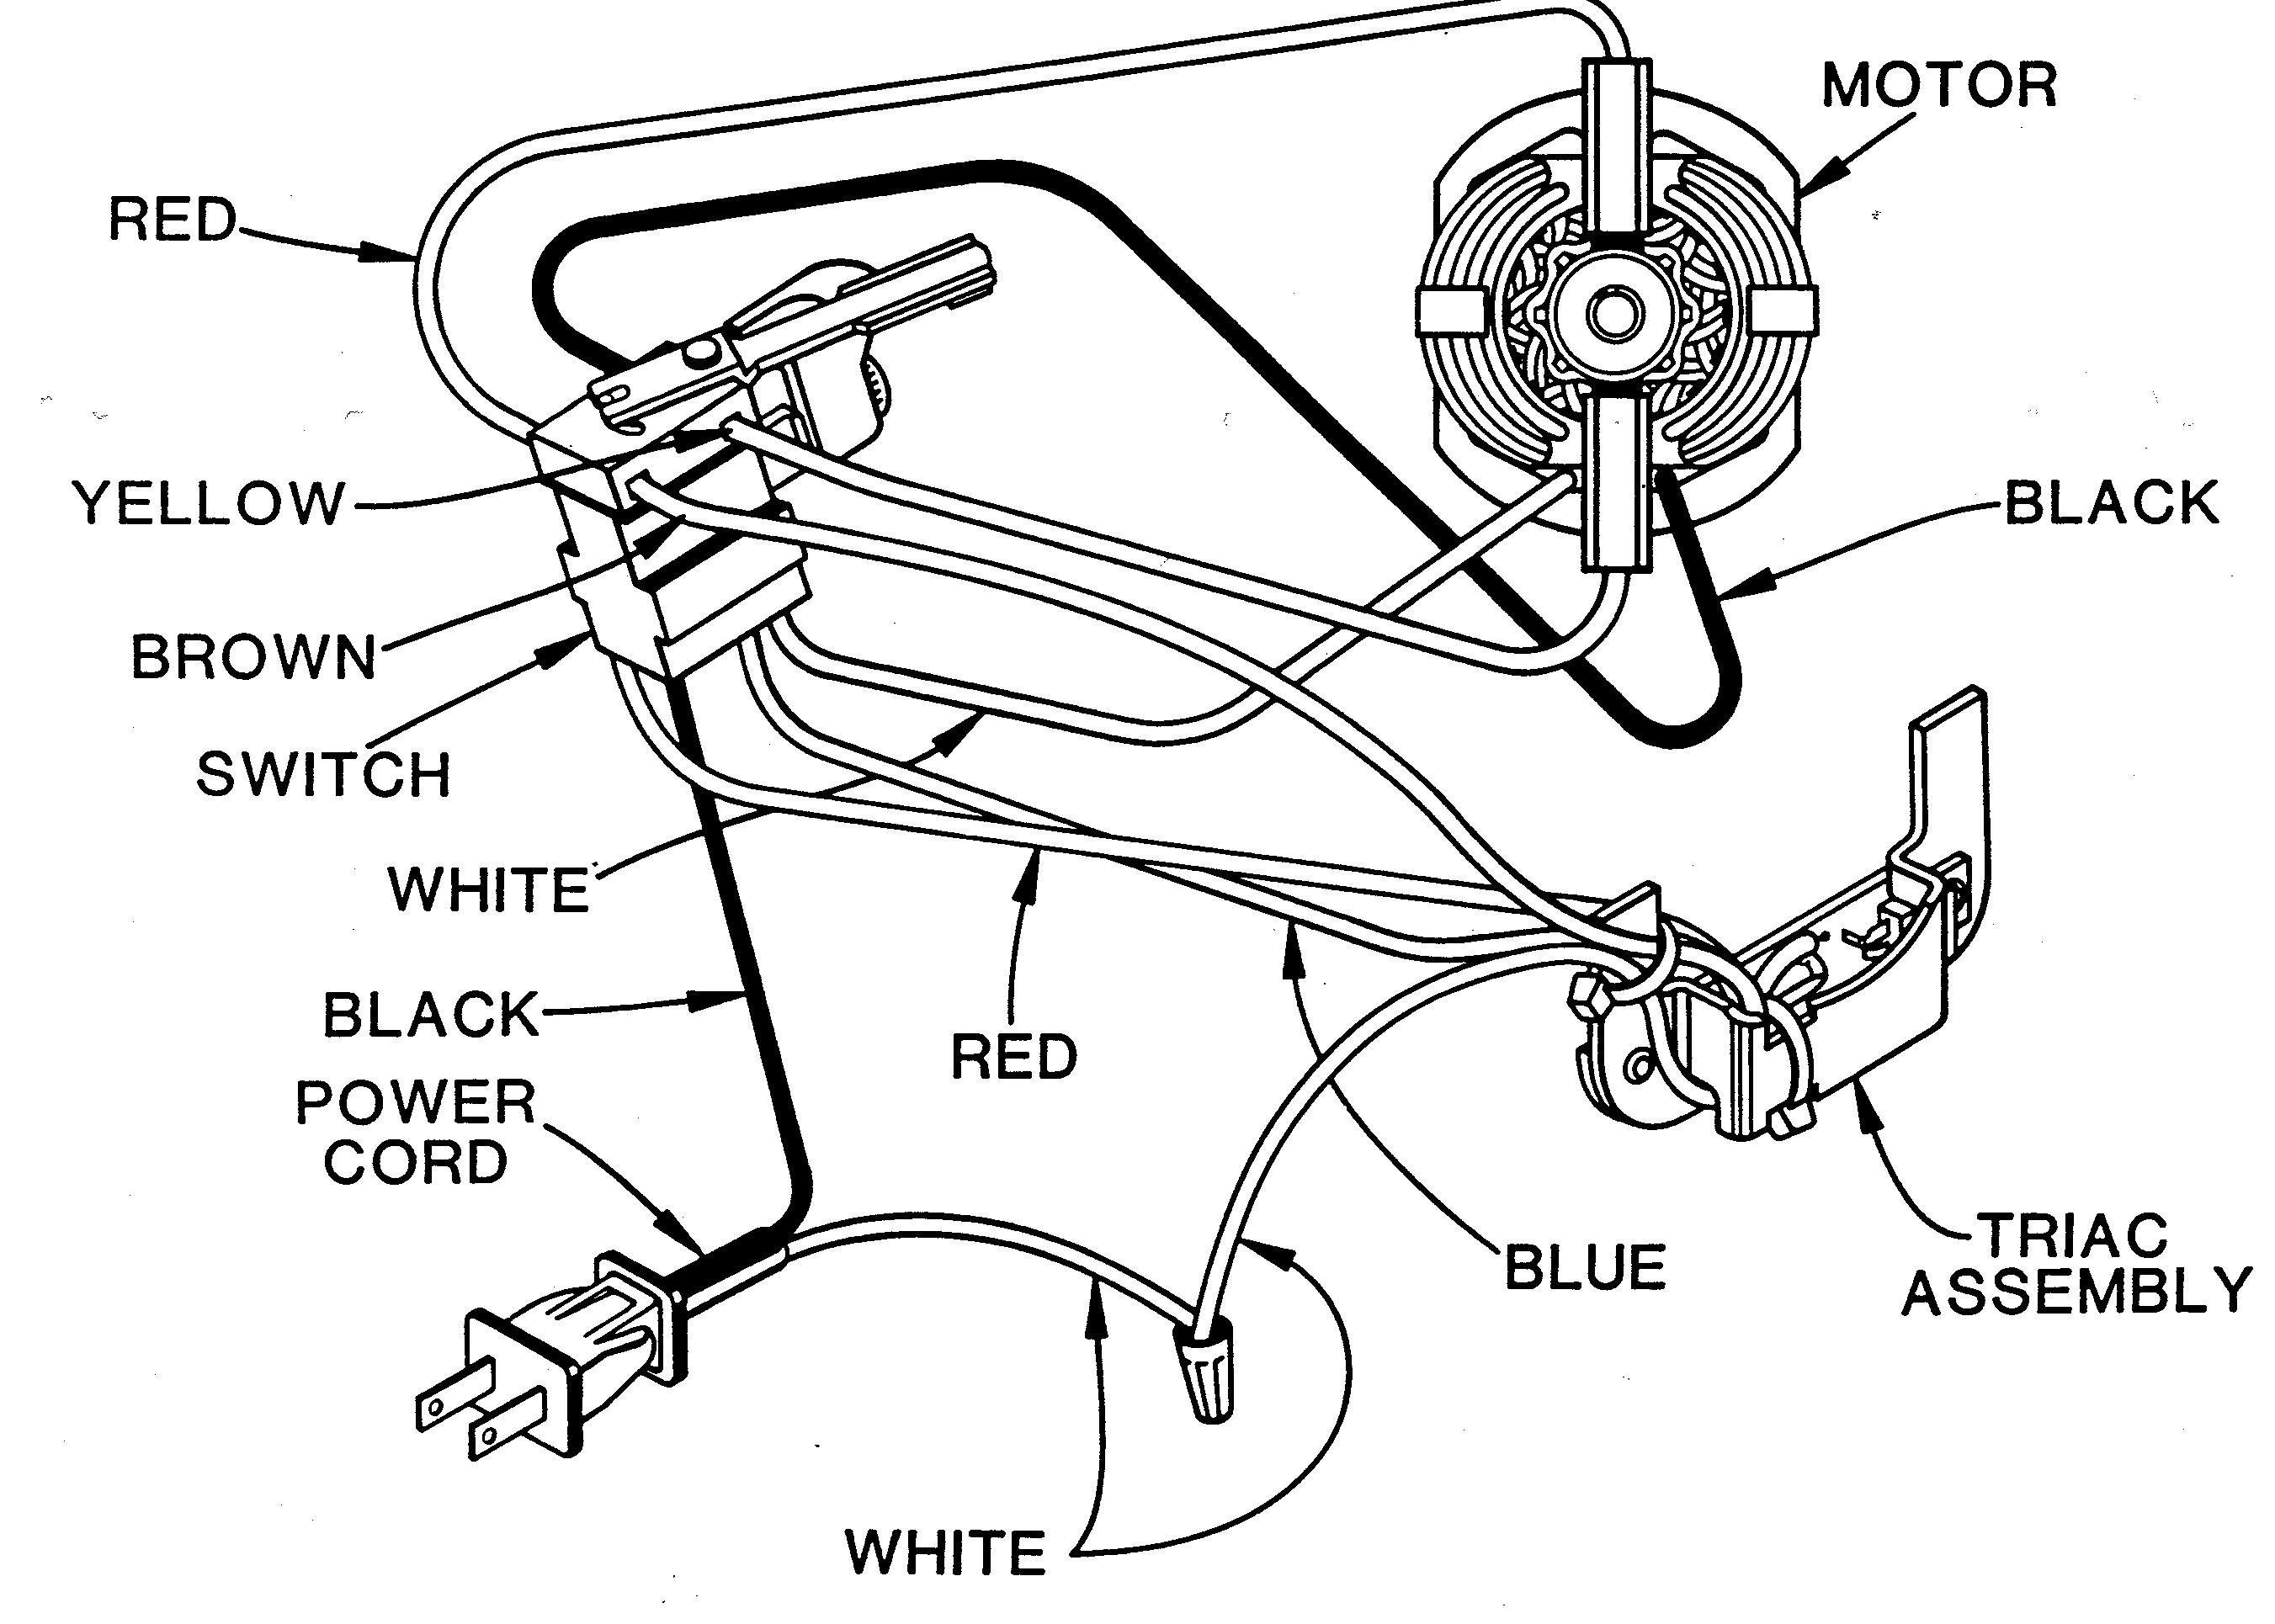 Craftsman model 315101120 drill reversing genuine parts